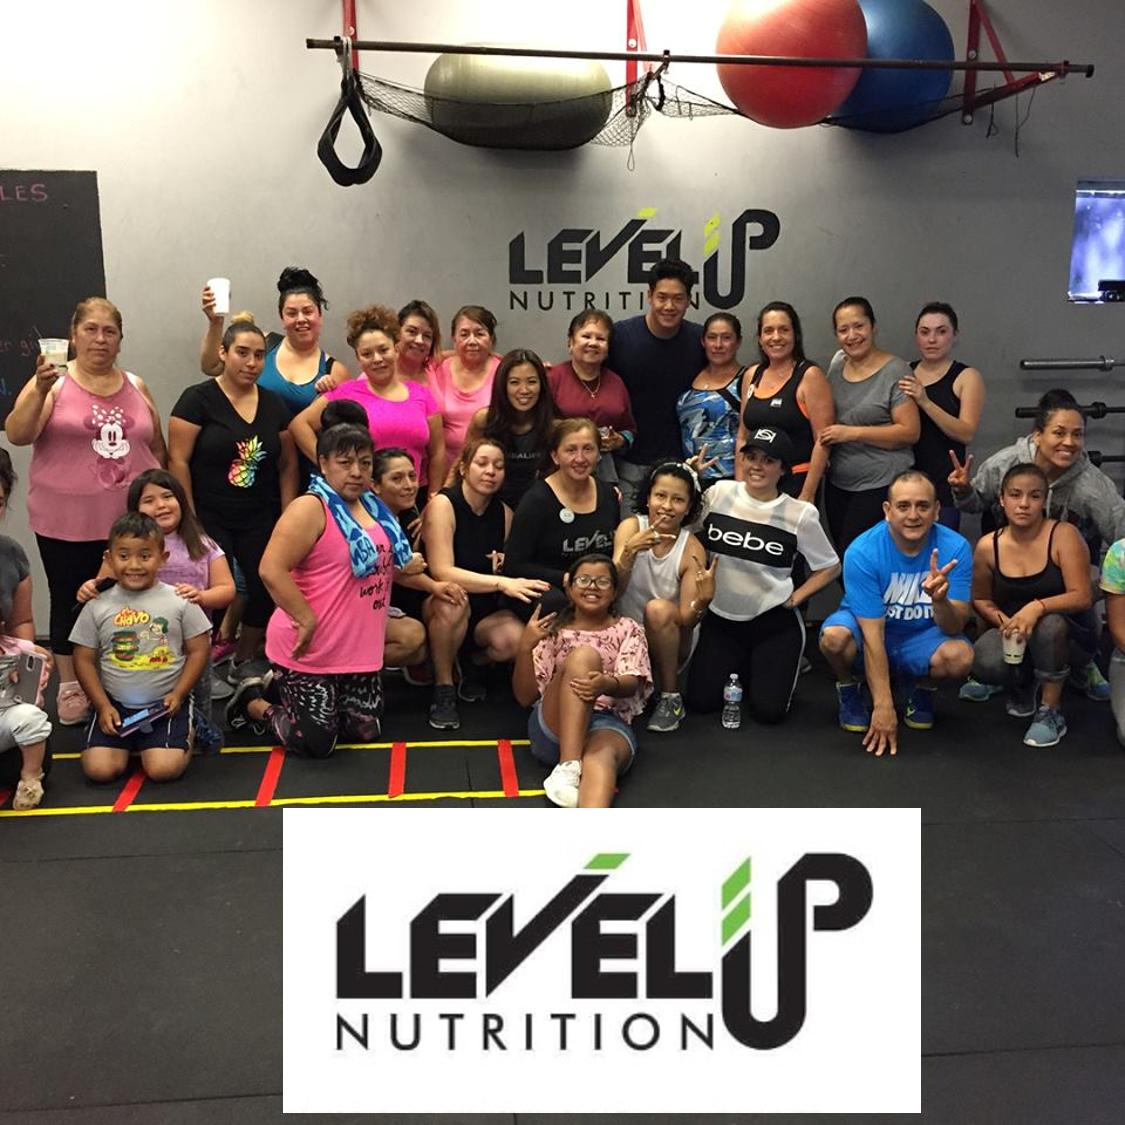 Level Up Nutrition image 2